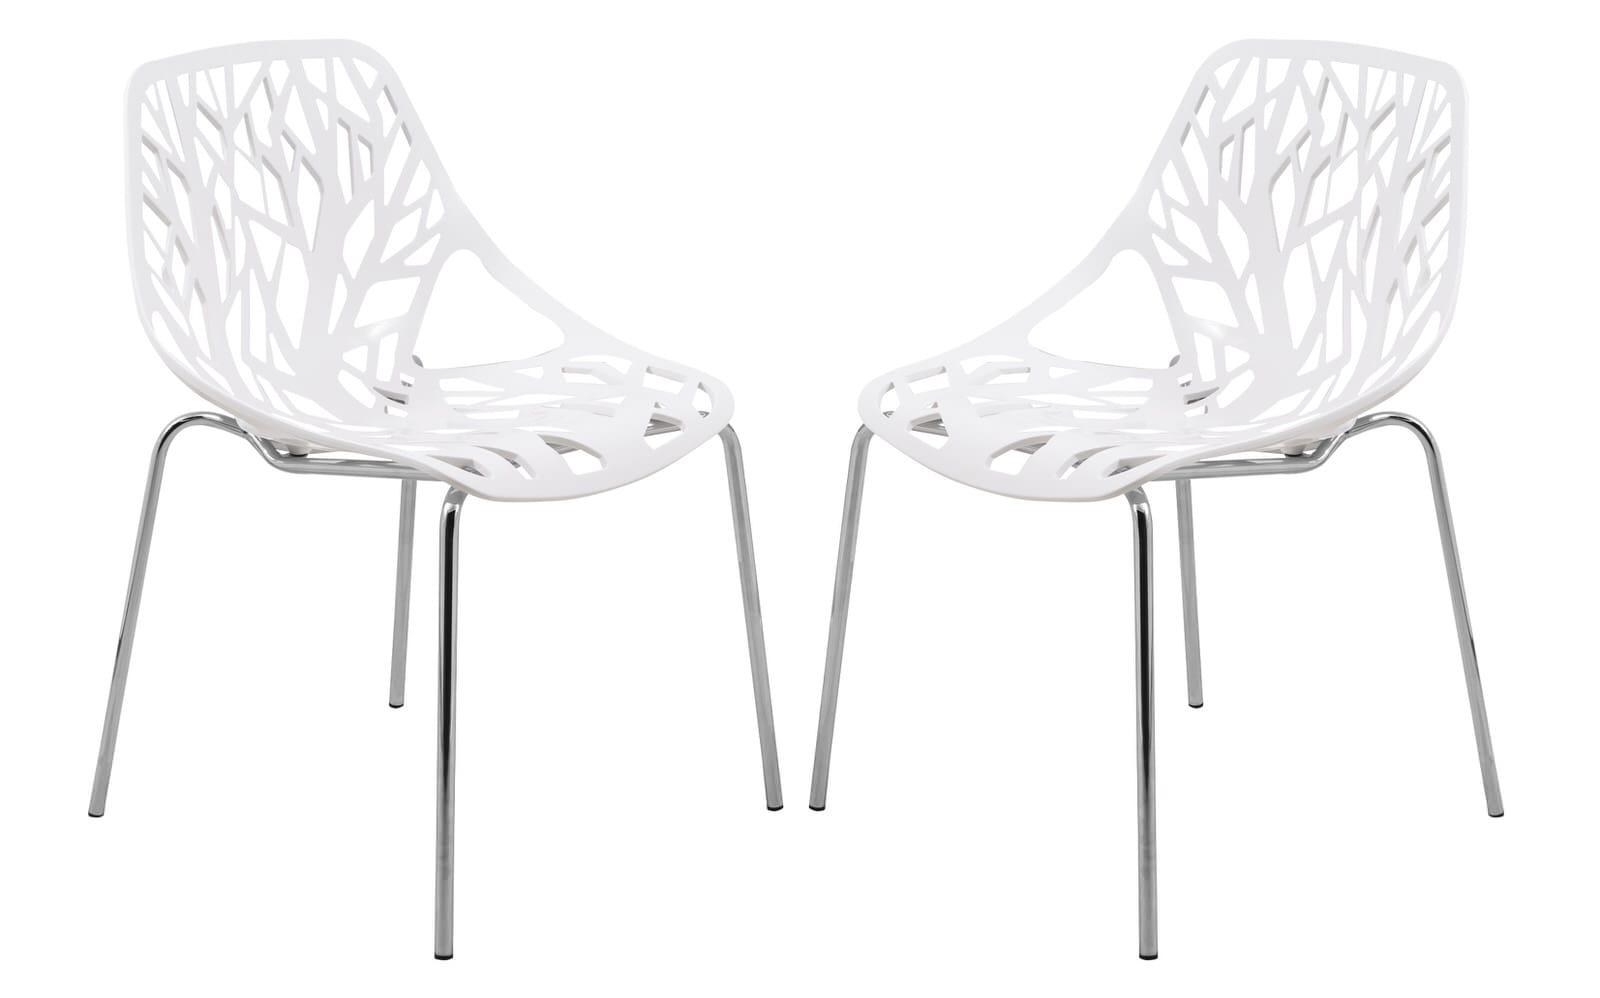 Asbury Modern White Dining Chair W/ Chromed Legs (Set Of 2) By LeisureMod